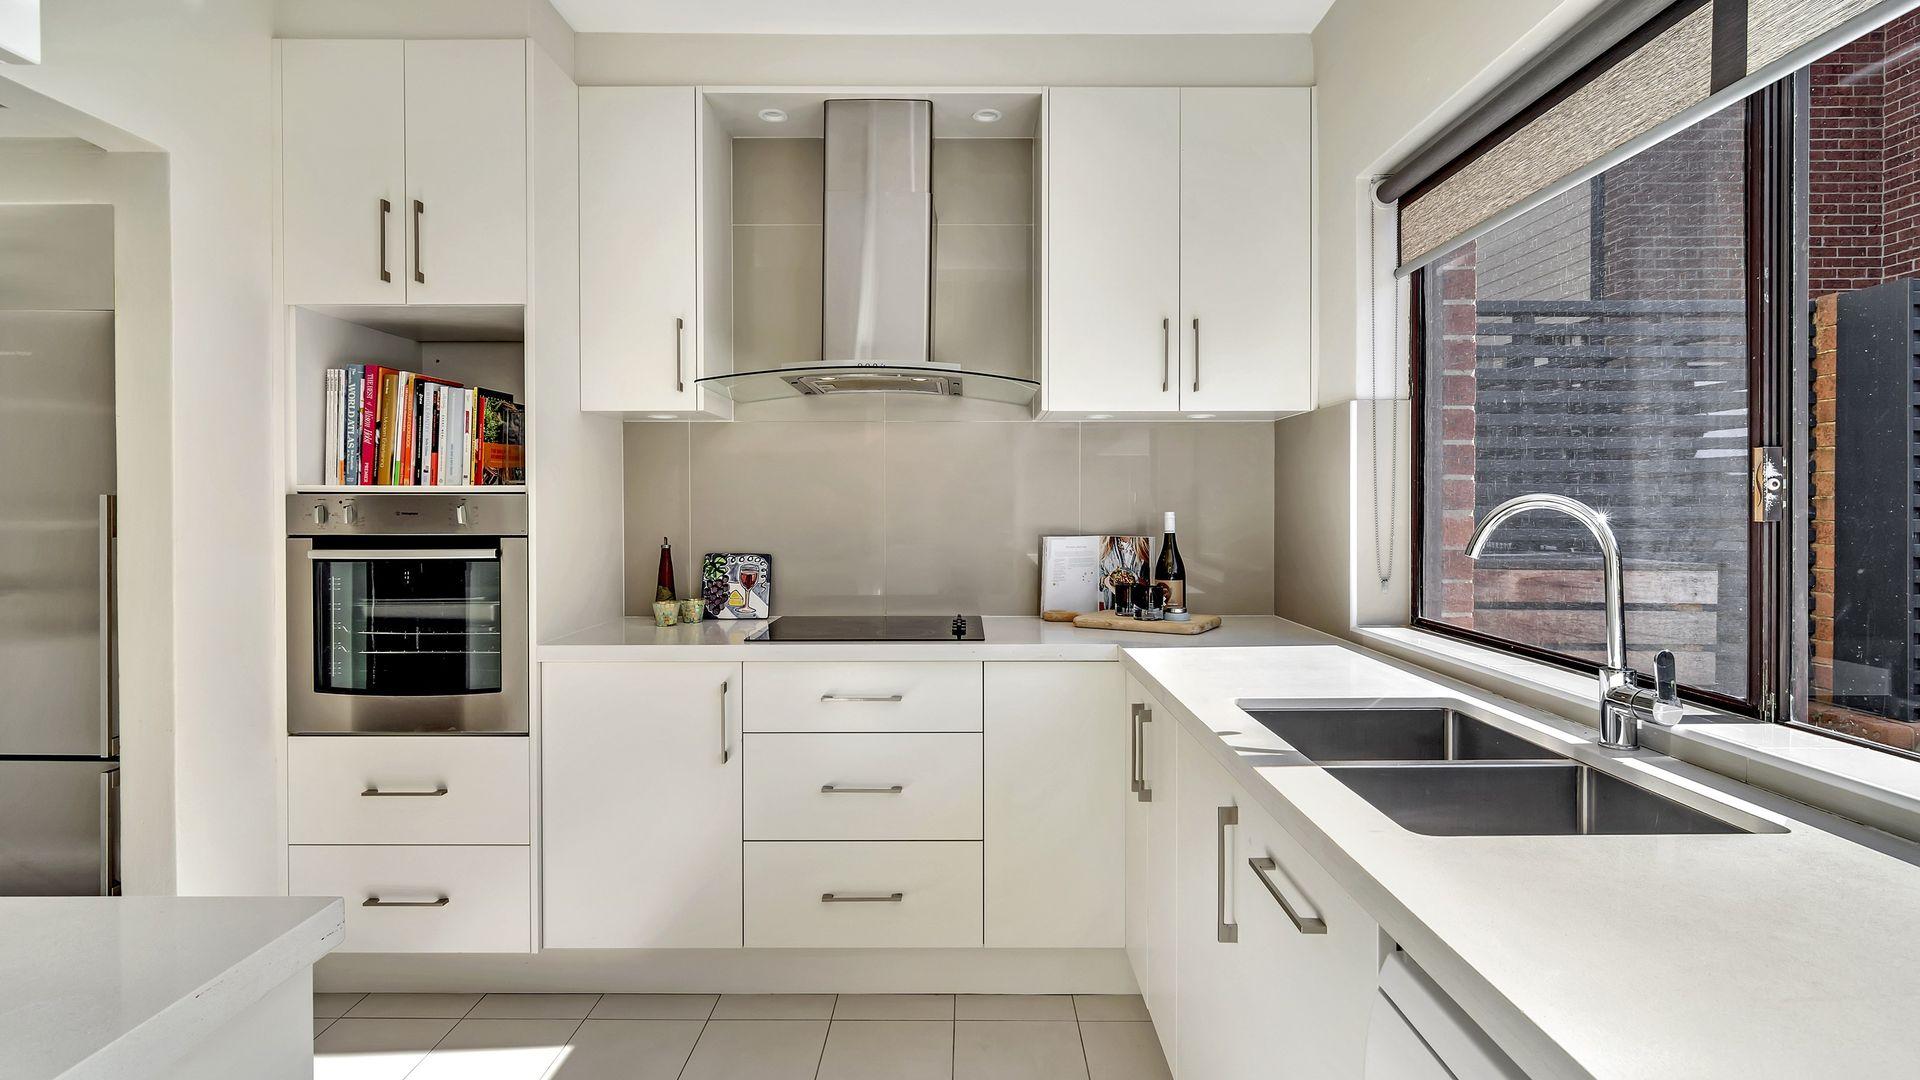 4/5-11 Benton Avenue, Artarmon NSW 2064, Image 2